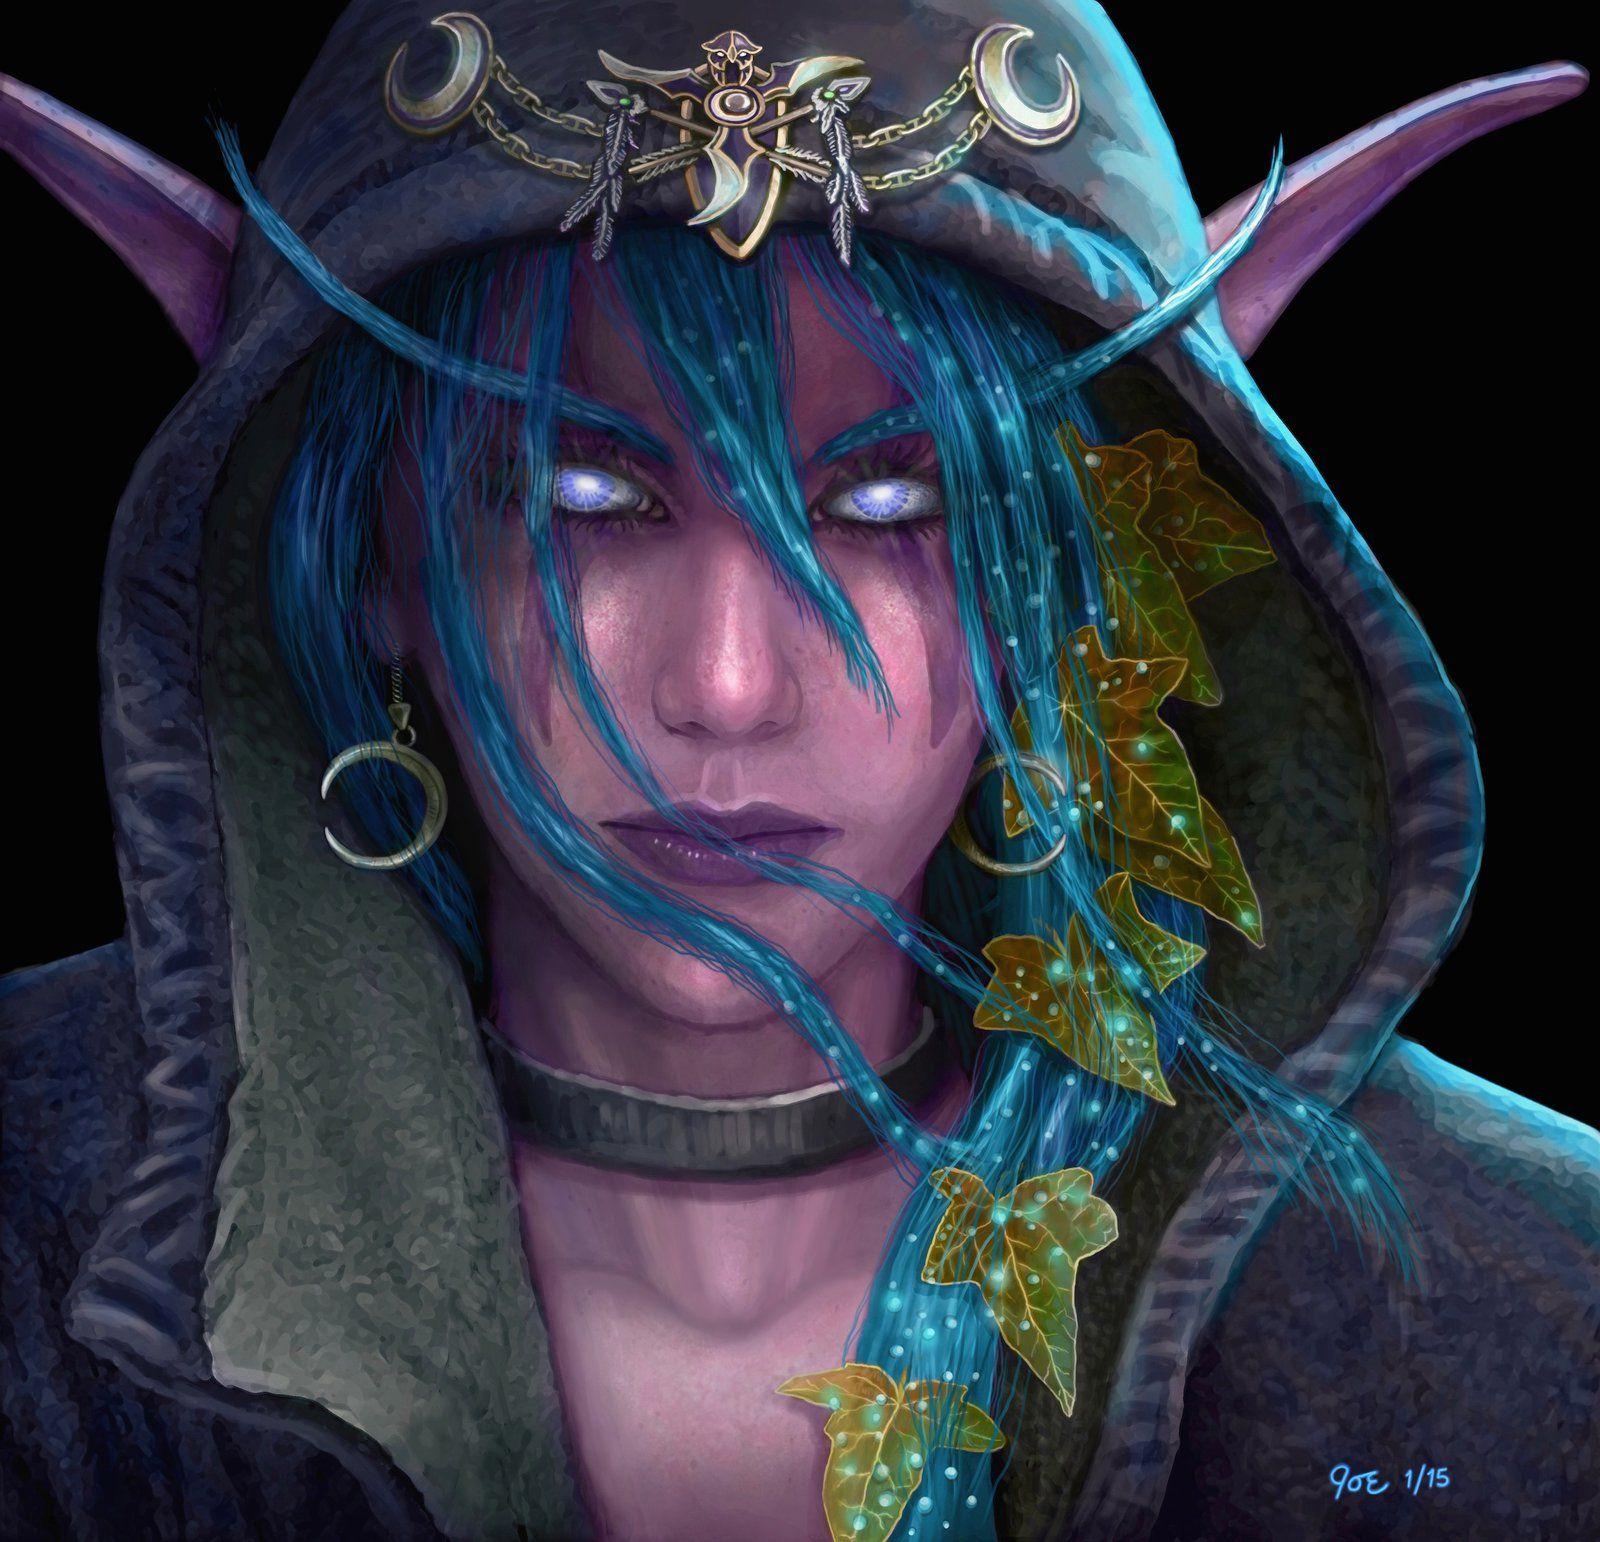 night elf - warcraftjoedomani on deviantart | fantasy art